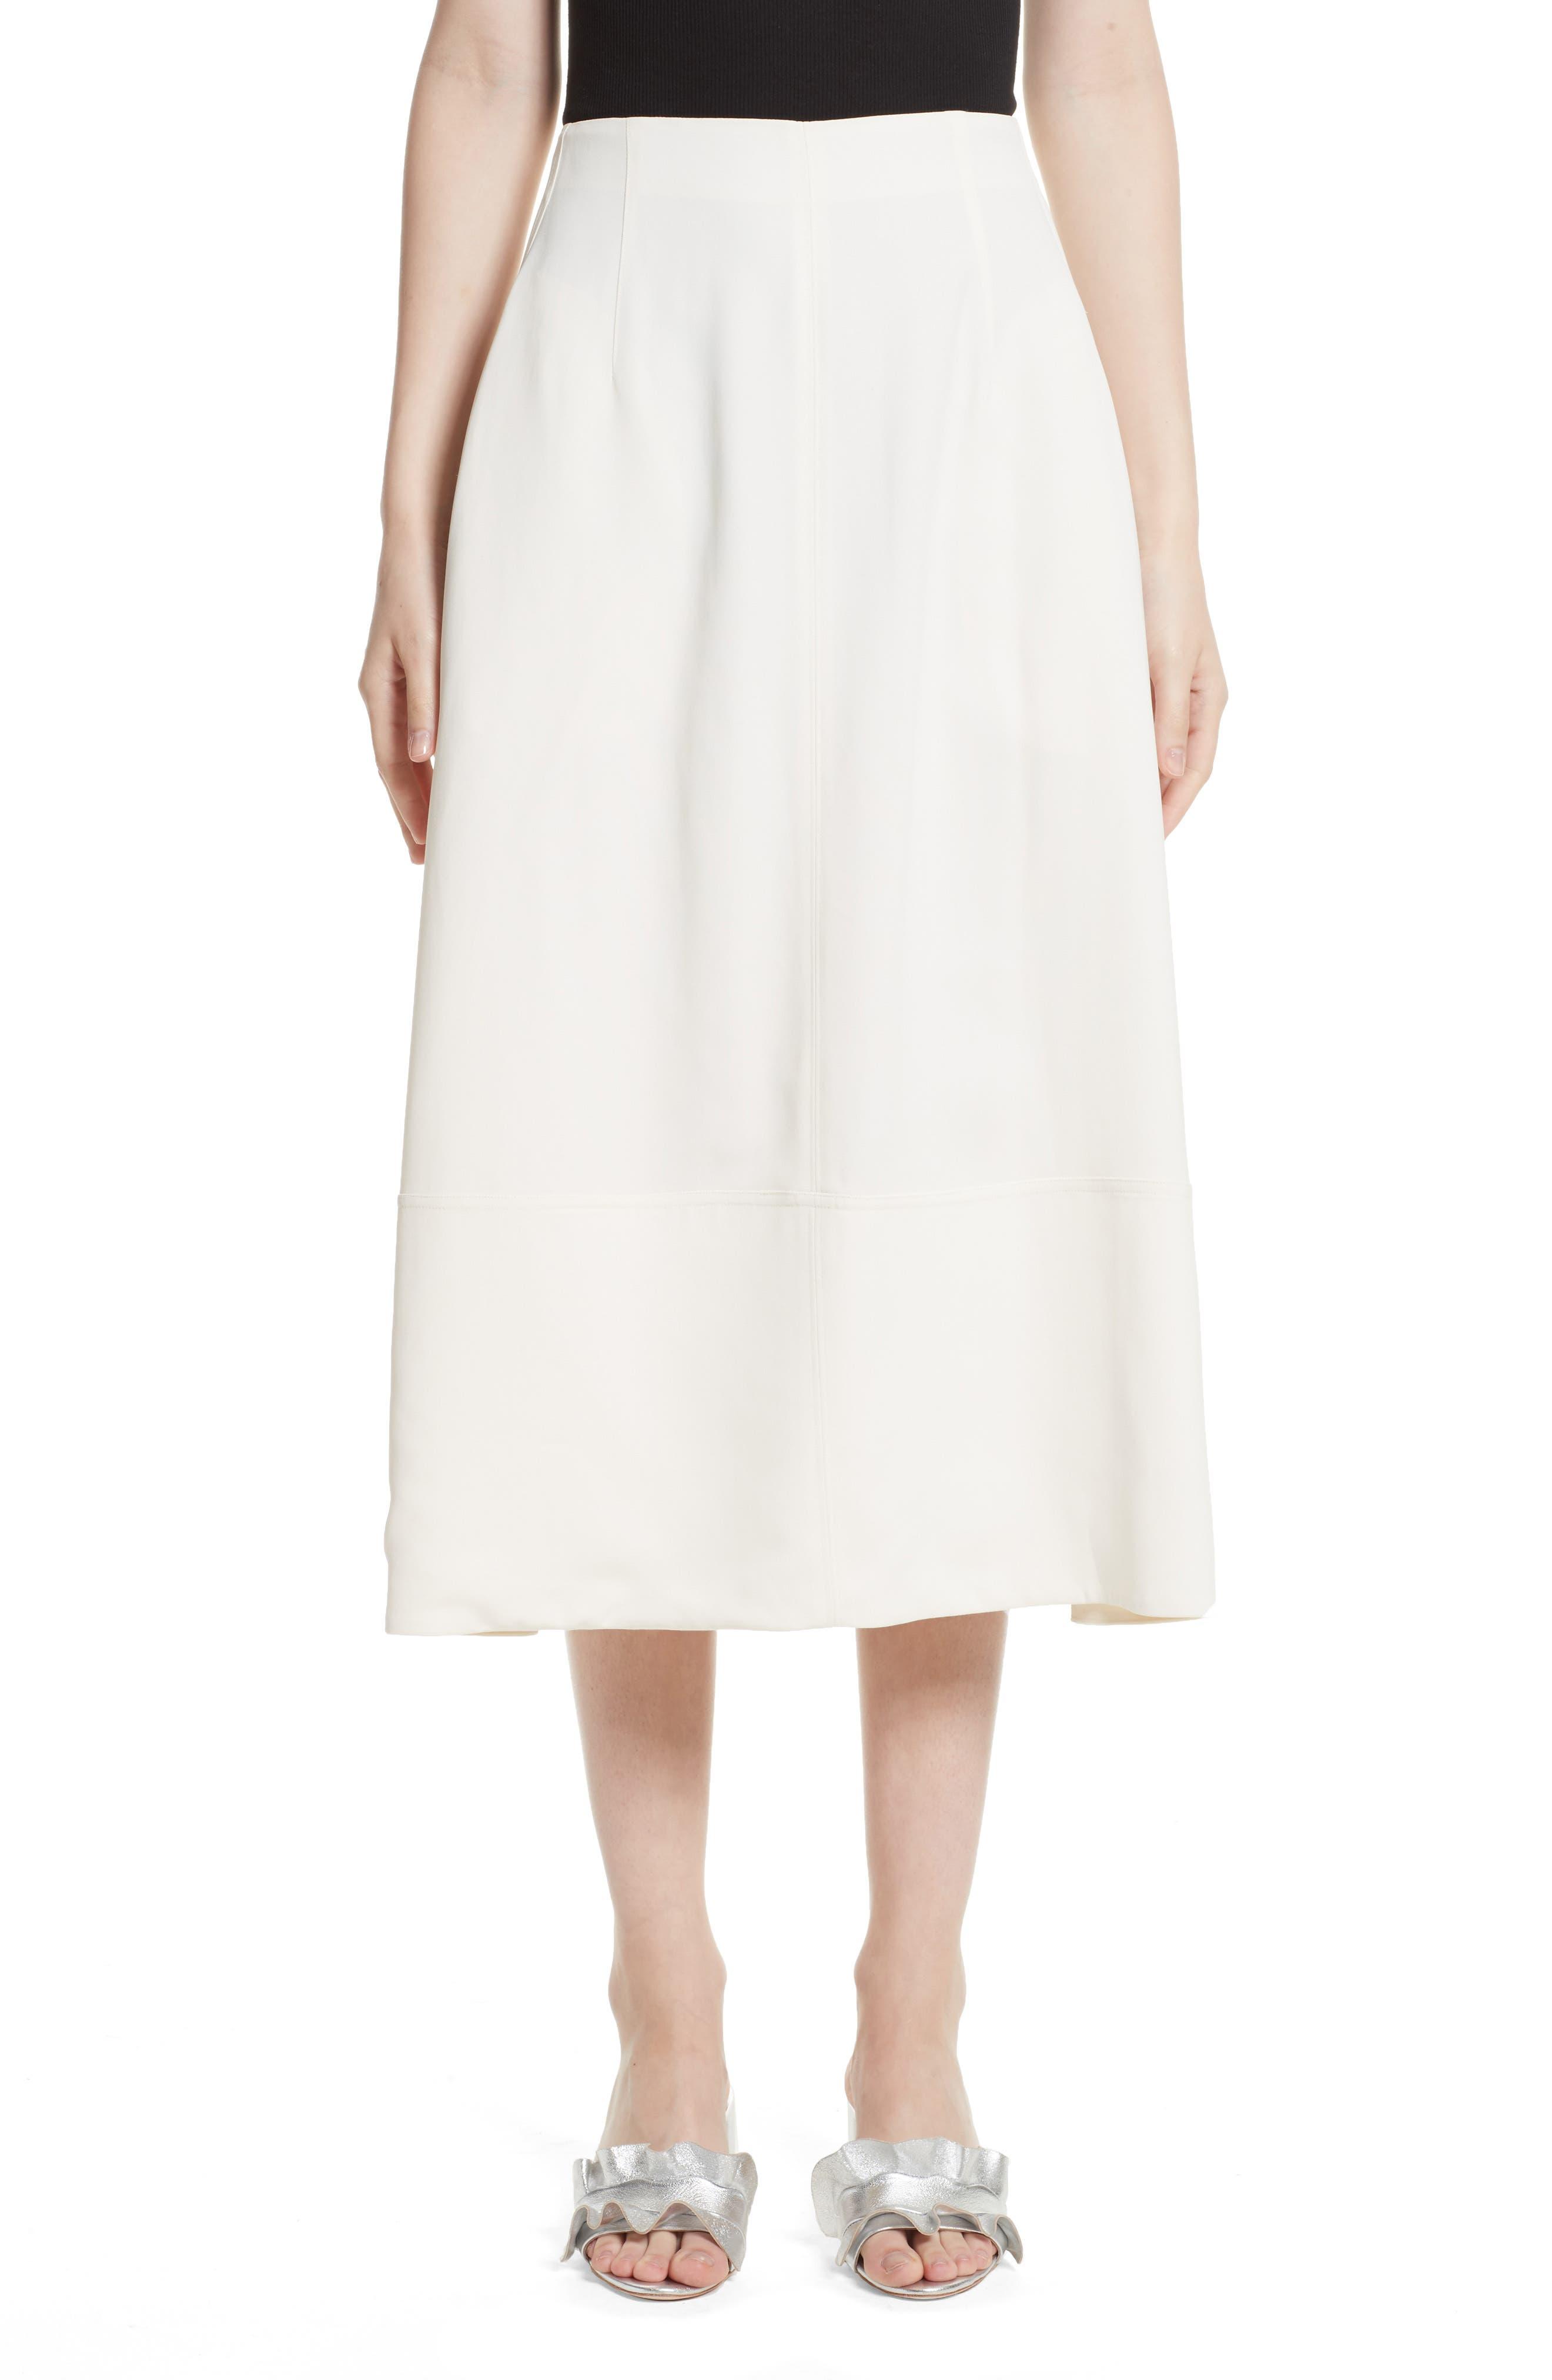 Lottie A-Line Midi Skirt,                             Main thumbnail 1, color,                             903